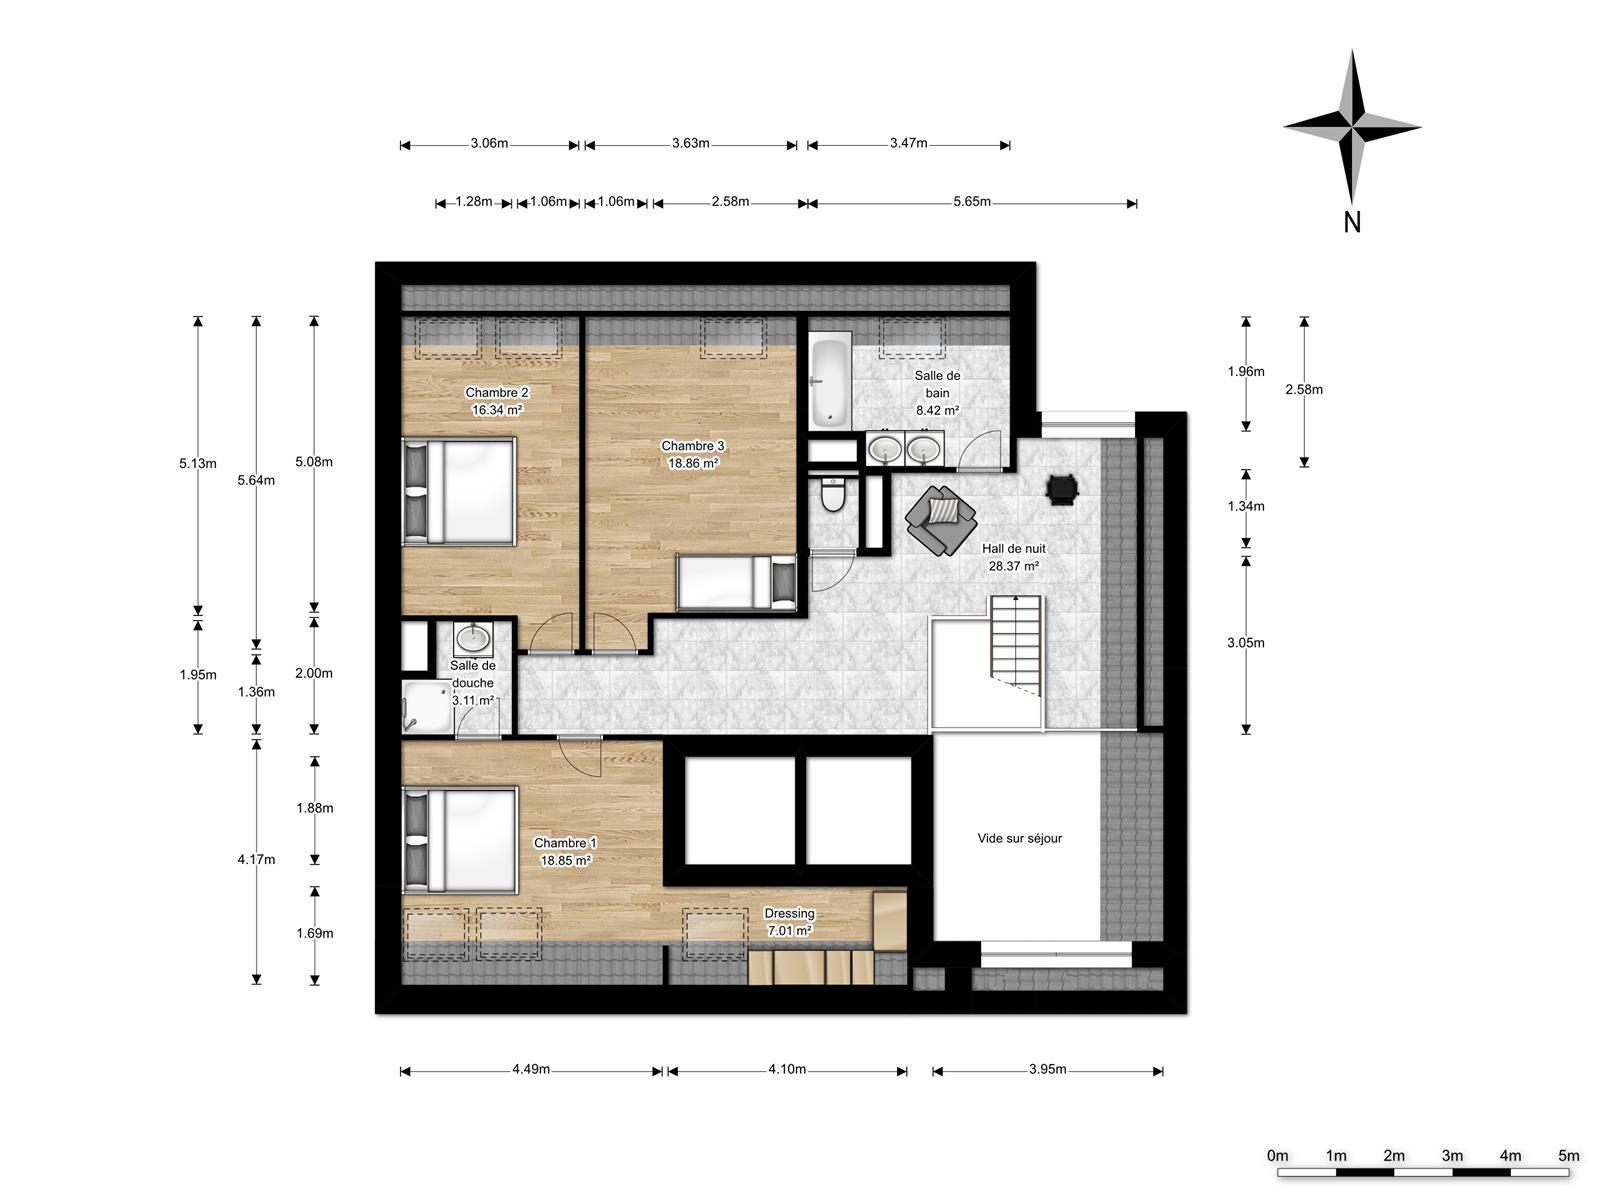 Appart. en duplex avec 3 ch, 2 sdb, 2 terrasses